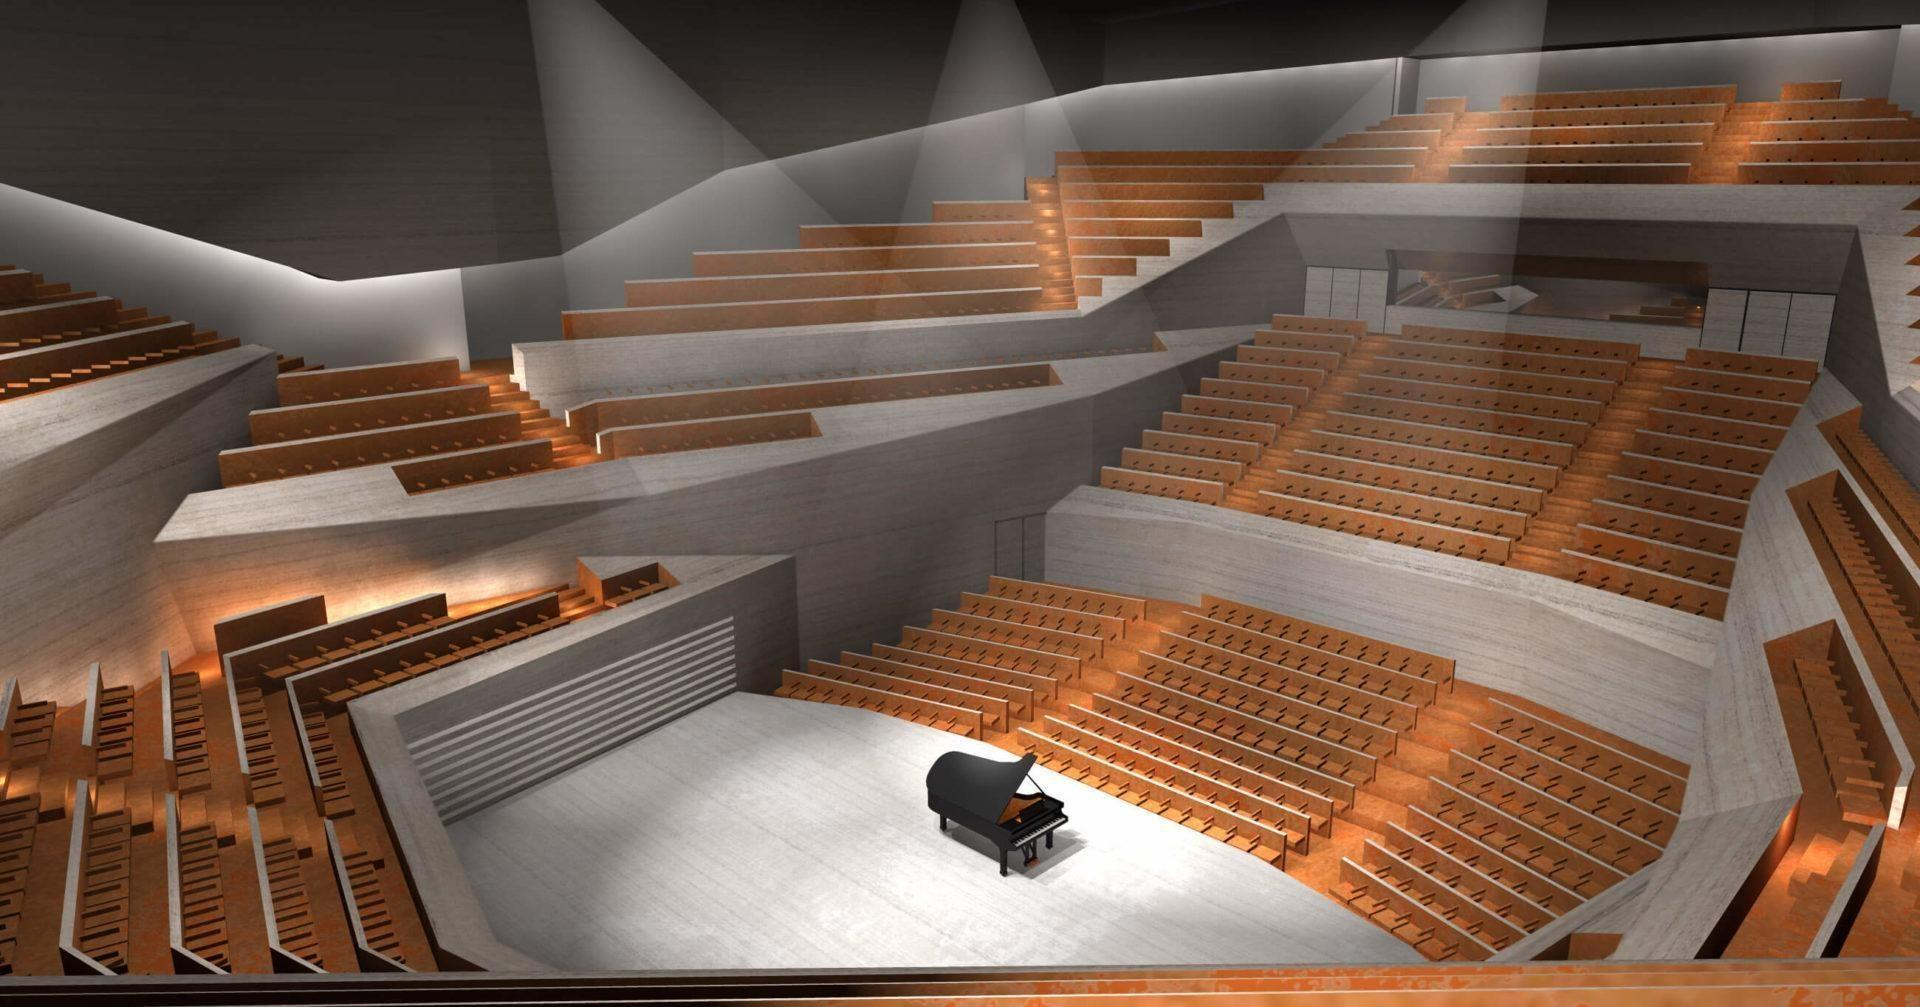 Varsói koncertterem belső látványa